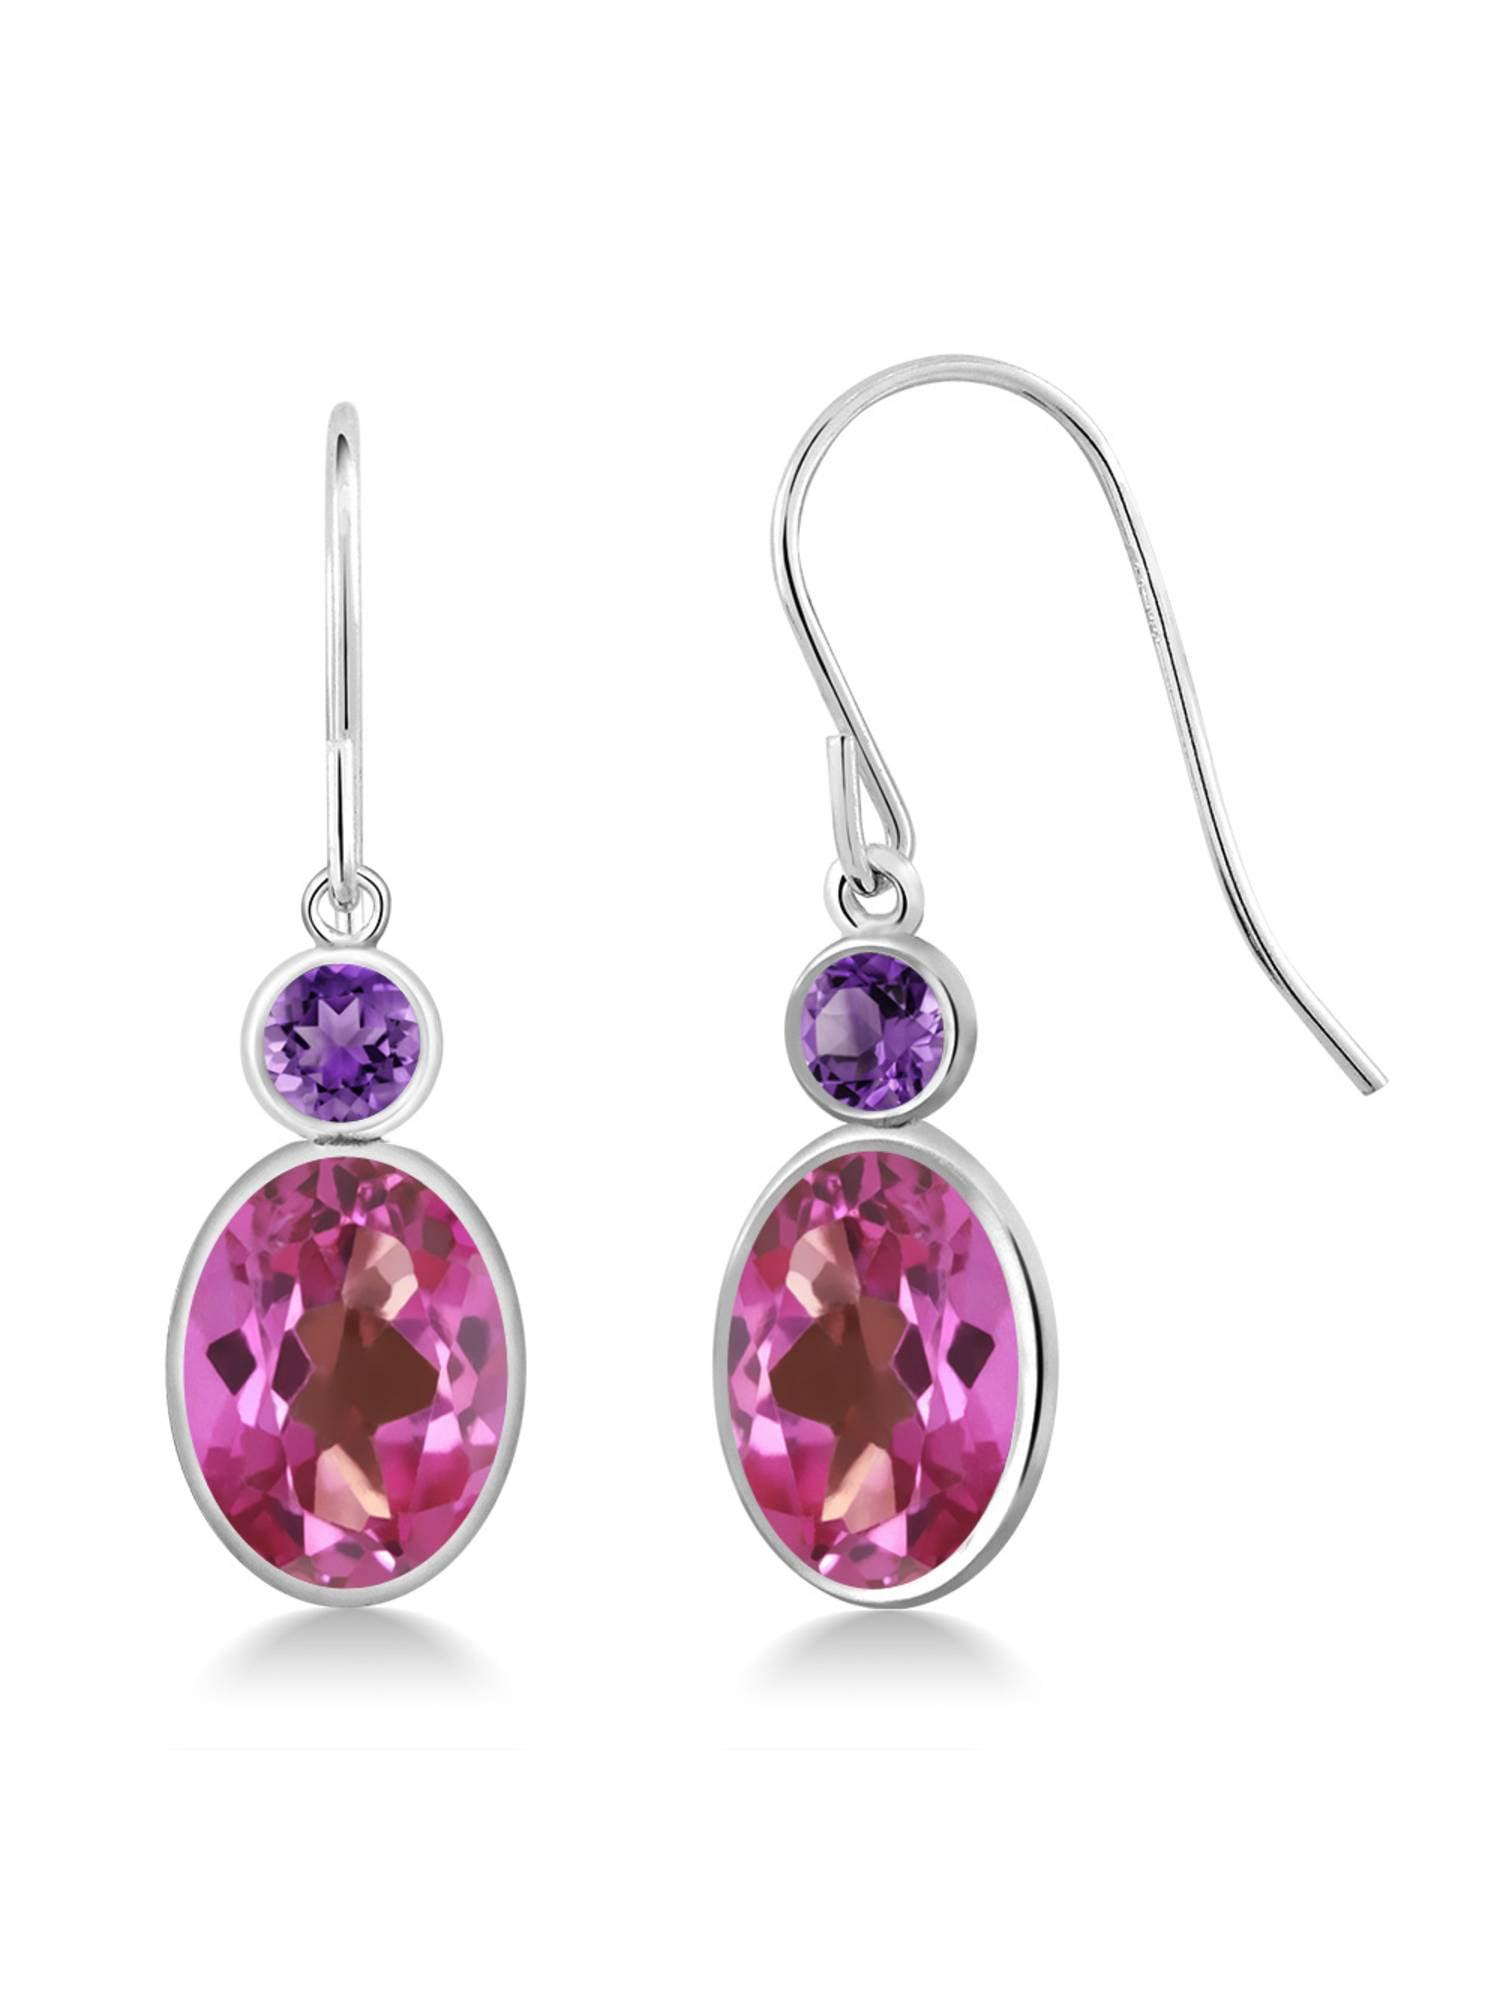 3.20 Ct Oval Pink Mystic Topaz Purple Amethyst 14K White Gold Earrings by